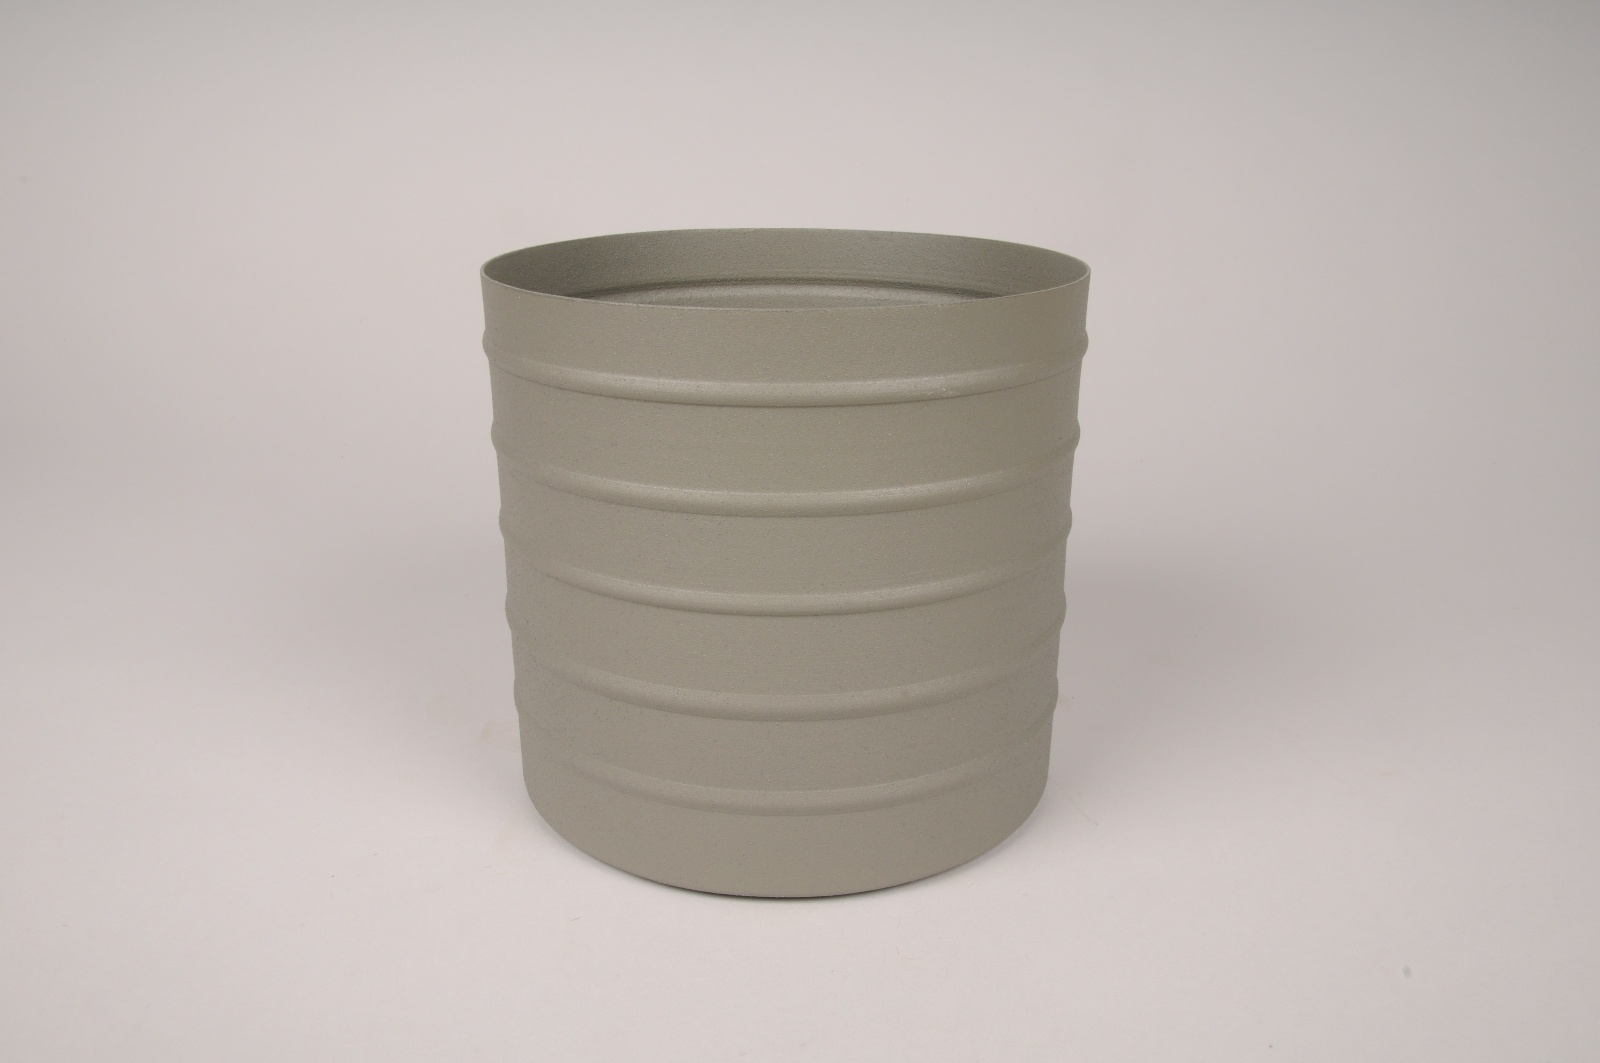 A011U9 Cache-pot en métal vert kaki D15.5cm H14cm